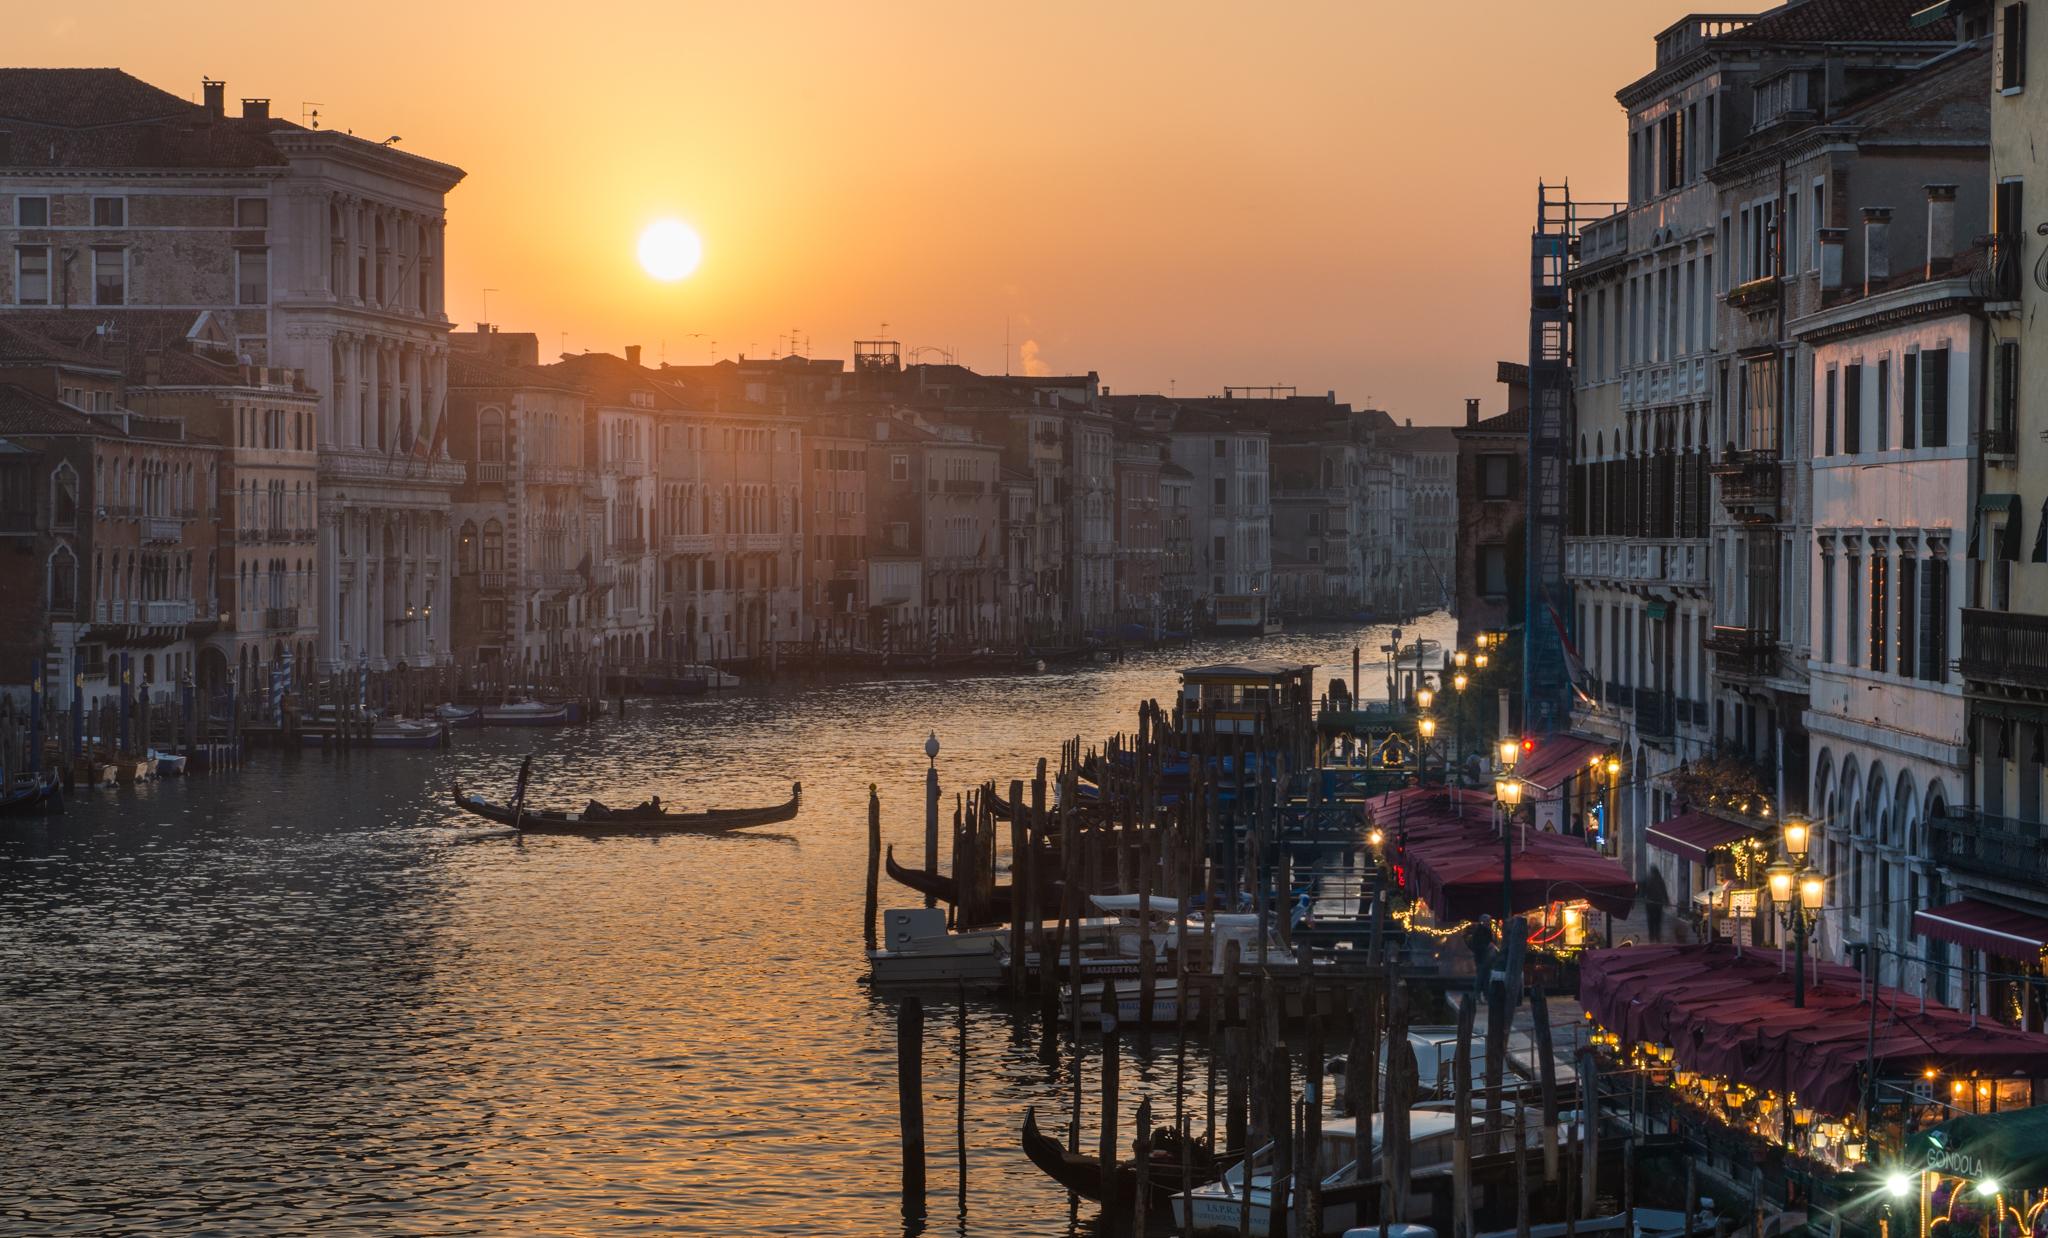 Italy_121417._CVB0325-Edit.jpg